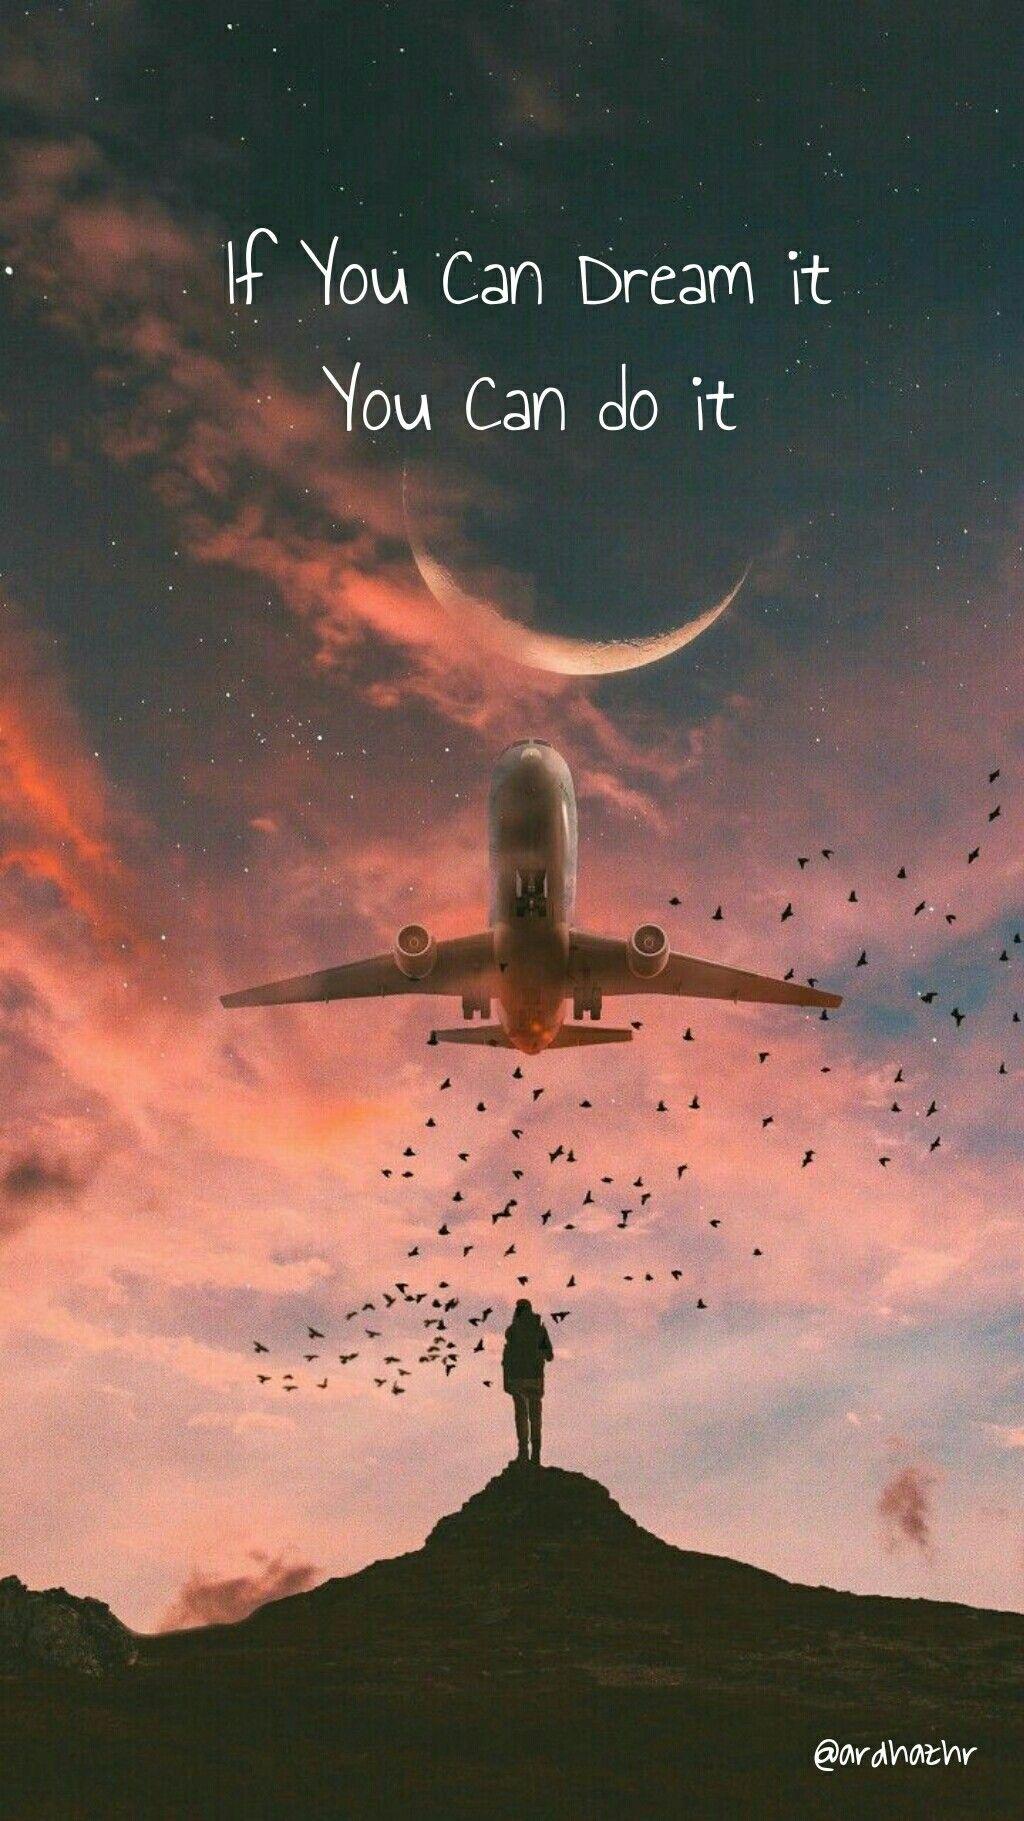 Quotes Wallpaper Aesthetic Dream Seni Airplane Wallpaper Wallpaper Quotes Pilot Quotes